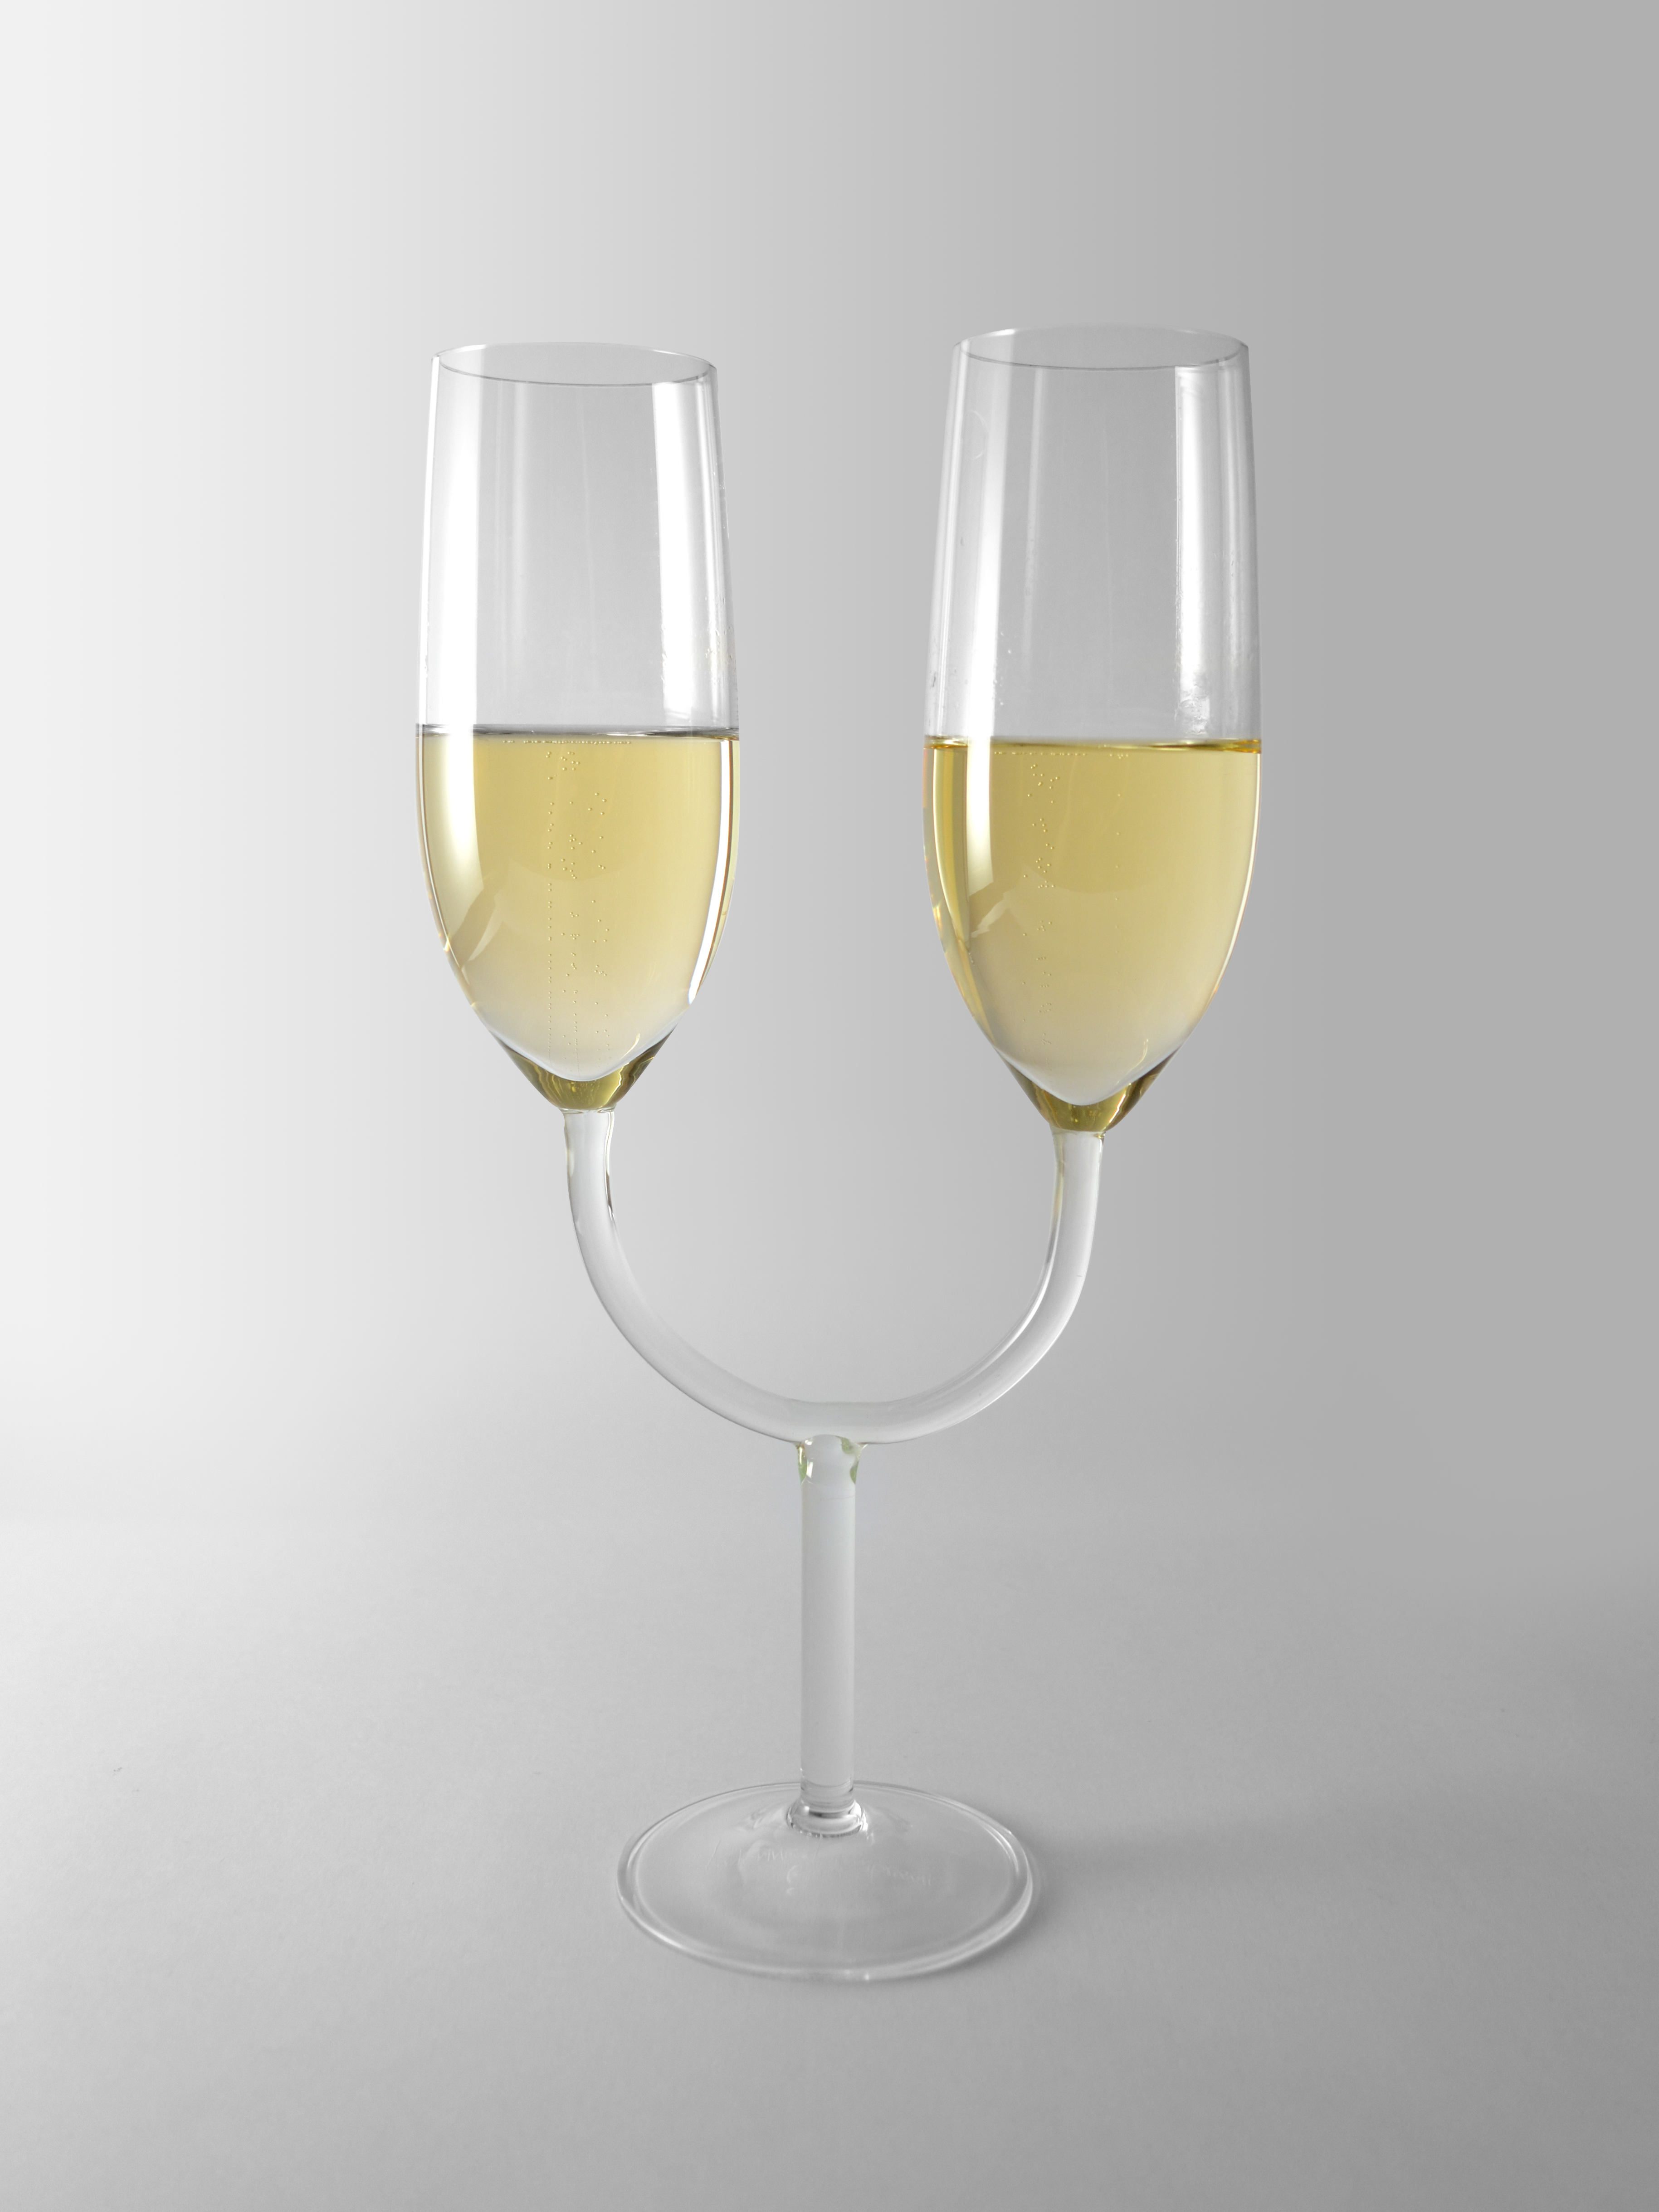 champagn_glass_c_katerina_kamprani_-_the_uncomfortable_5ddff225110ff.jpg